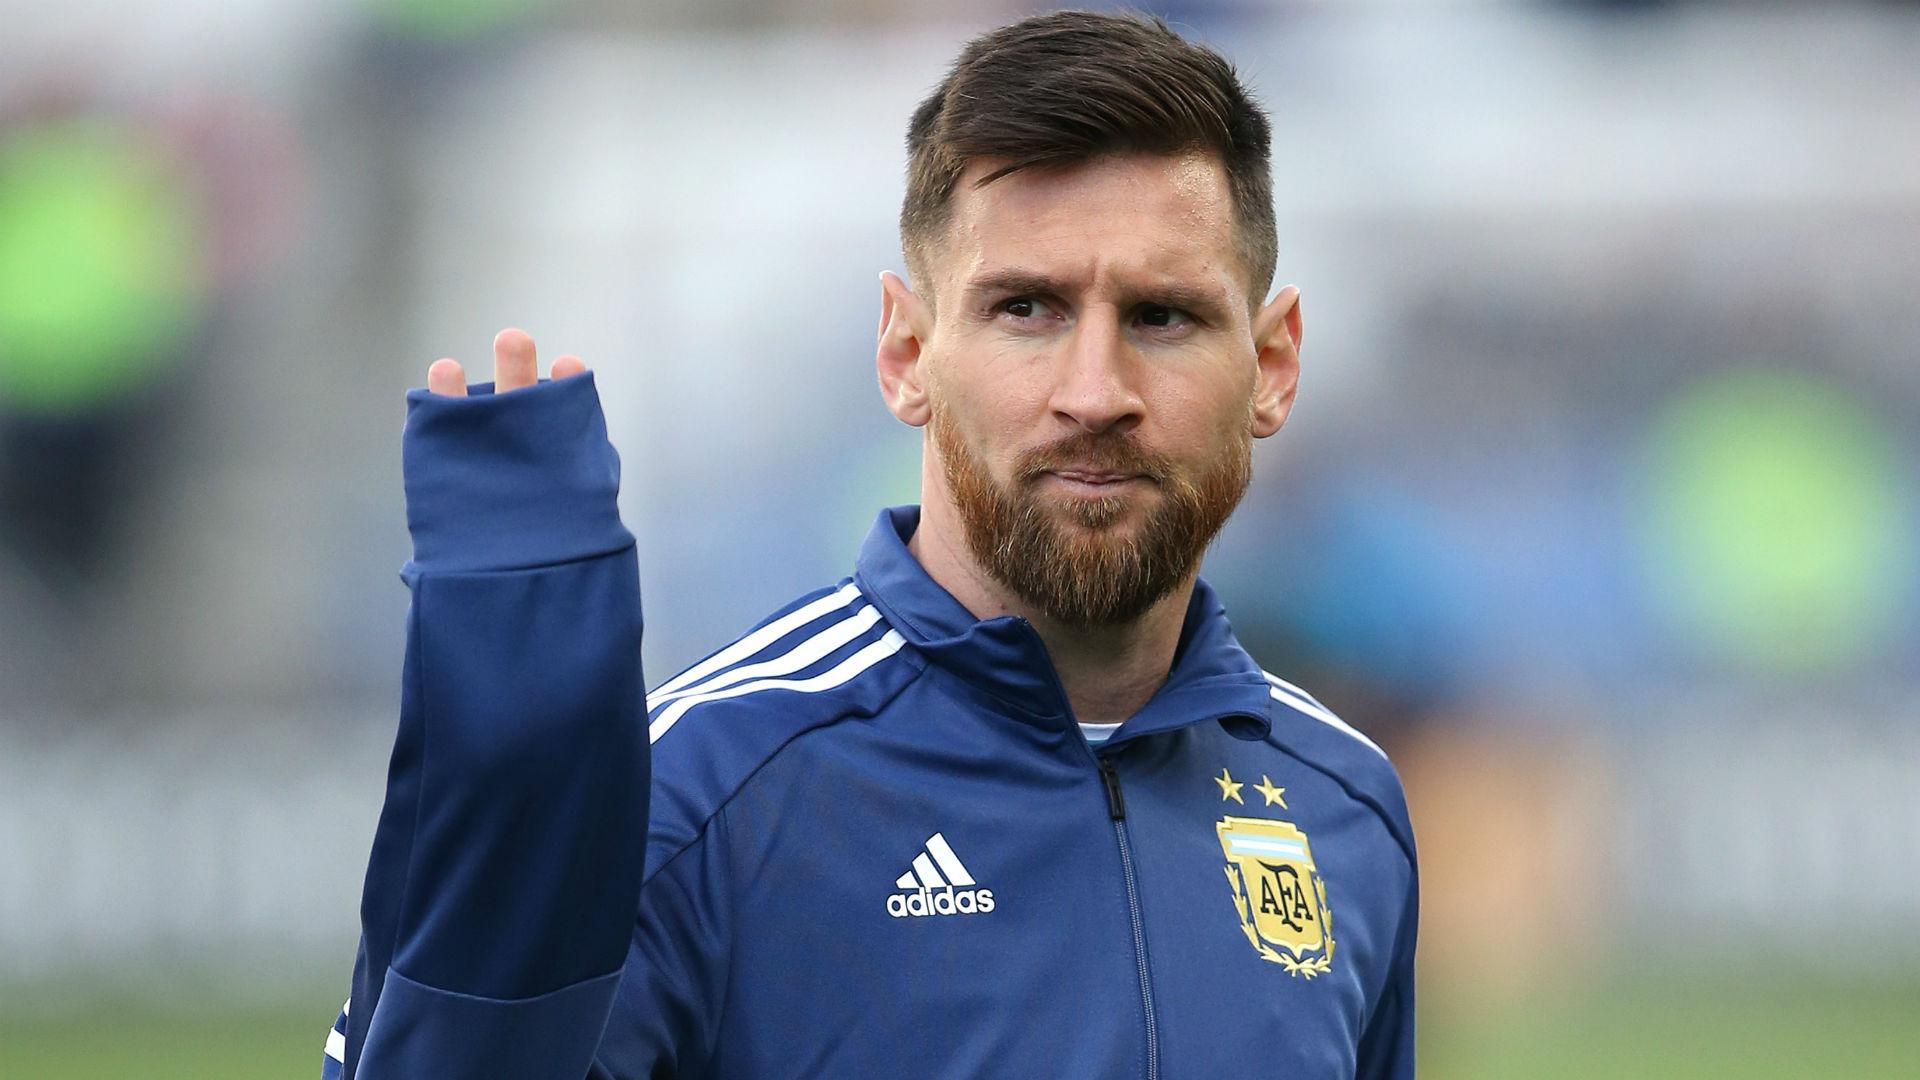 Brazil 0-1 Argentina: Returning Messi extends Selecao's winless run